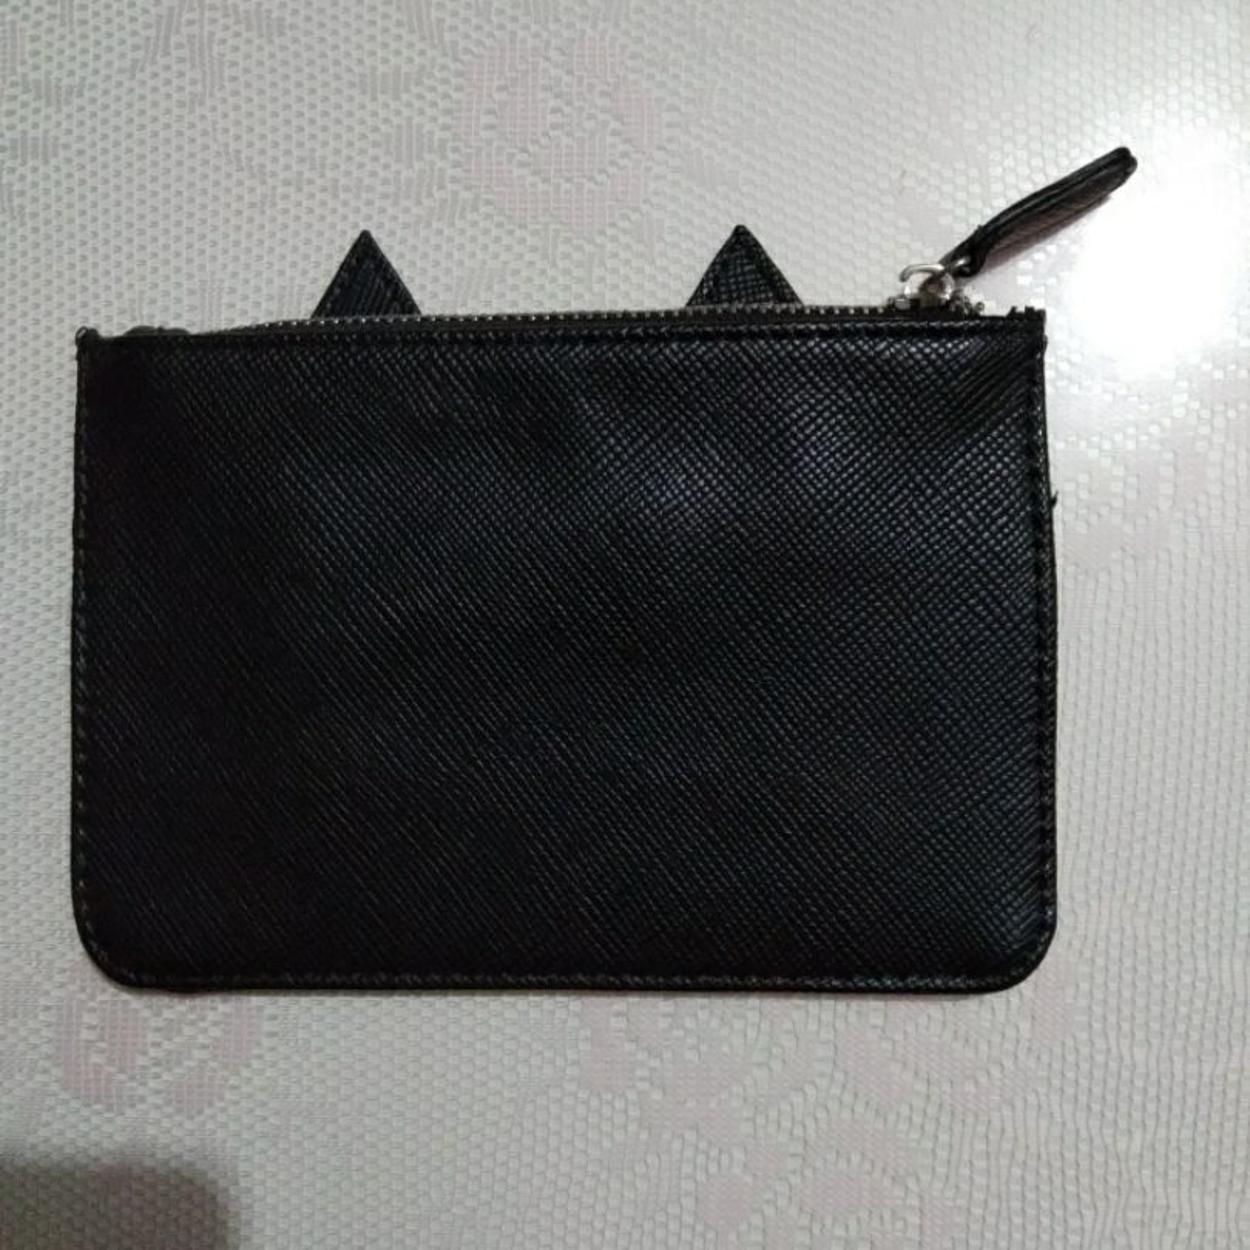 Urban Outfitters Portföy/El çantası